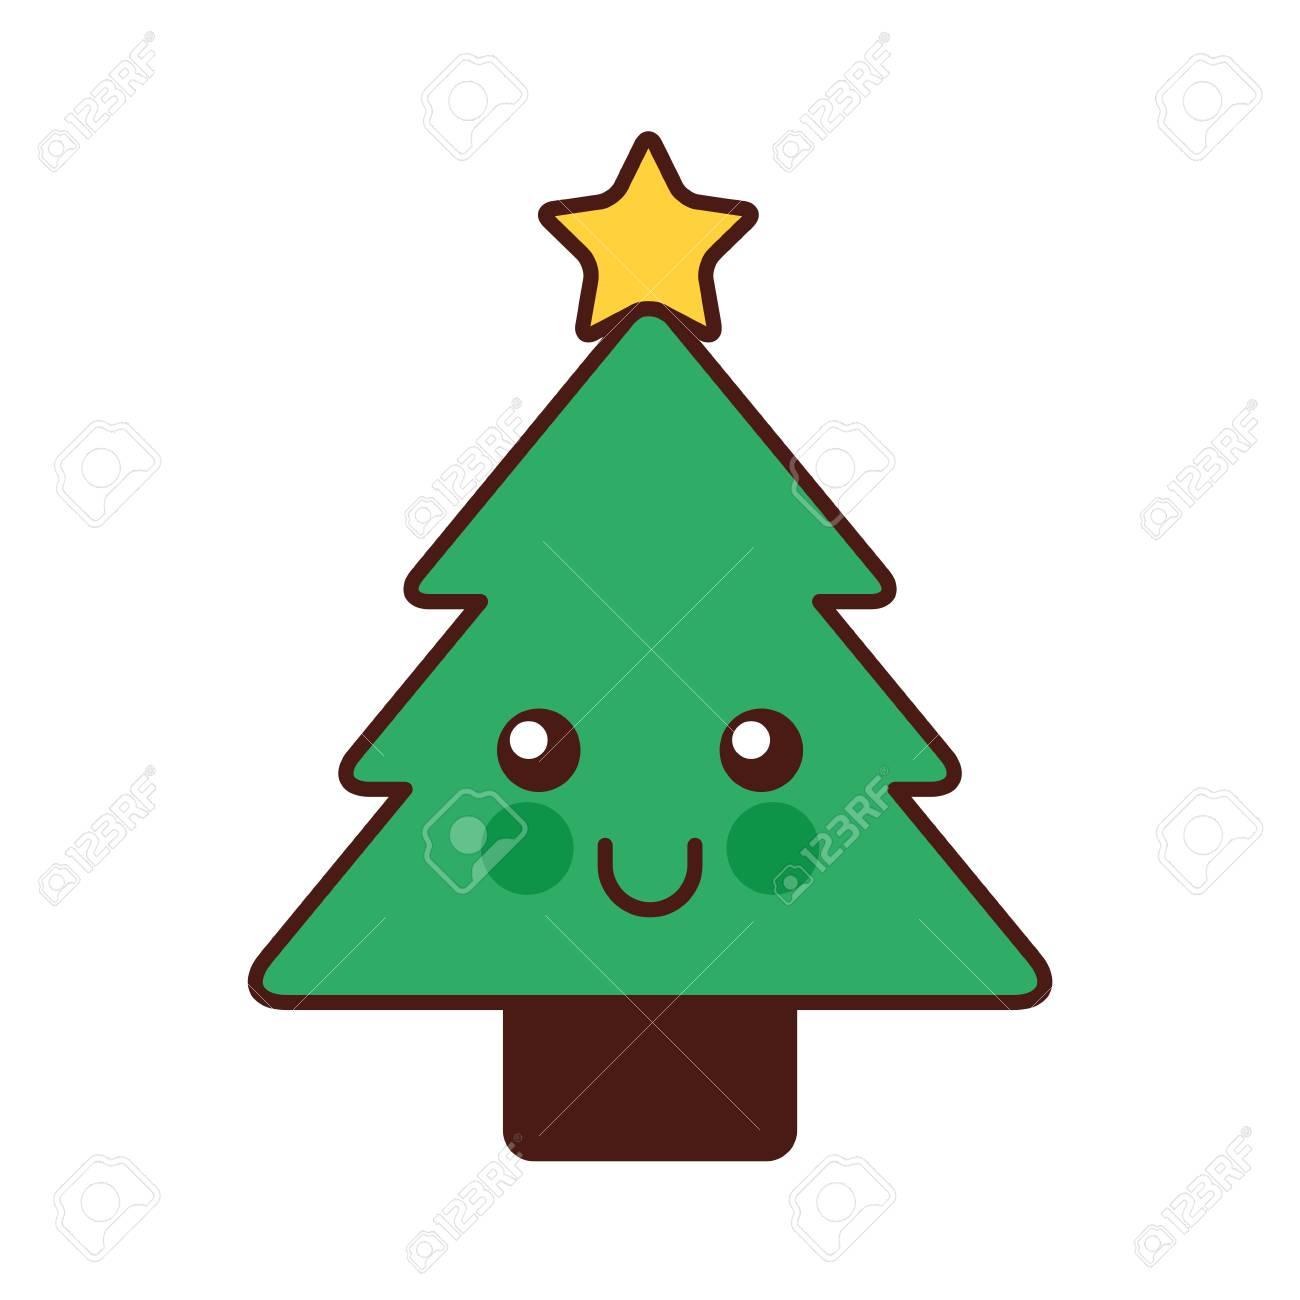 Kawaii Christmas Tree Pine Decoration Cartoon Vector Illustration Royalty Free Cliparts Vectors And Stock Illustration Image 88403677 Holidays, santa claus, snowman,gingerbread man, christmas elf, christmas tree, christmas pud развернуть. kawaii christmas tree pine decoration cartoon vector illustration